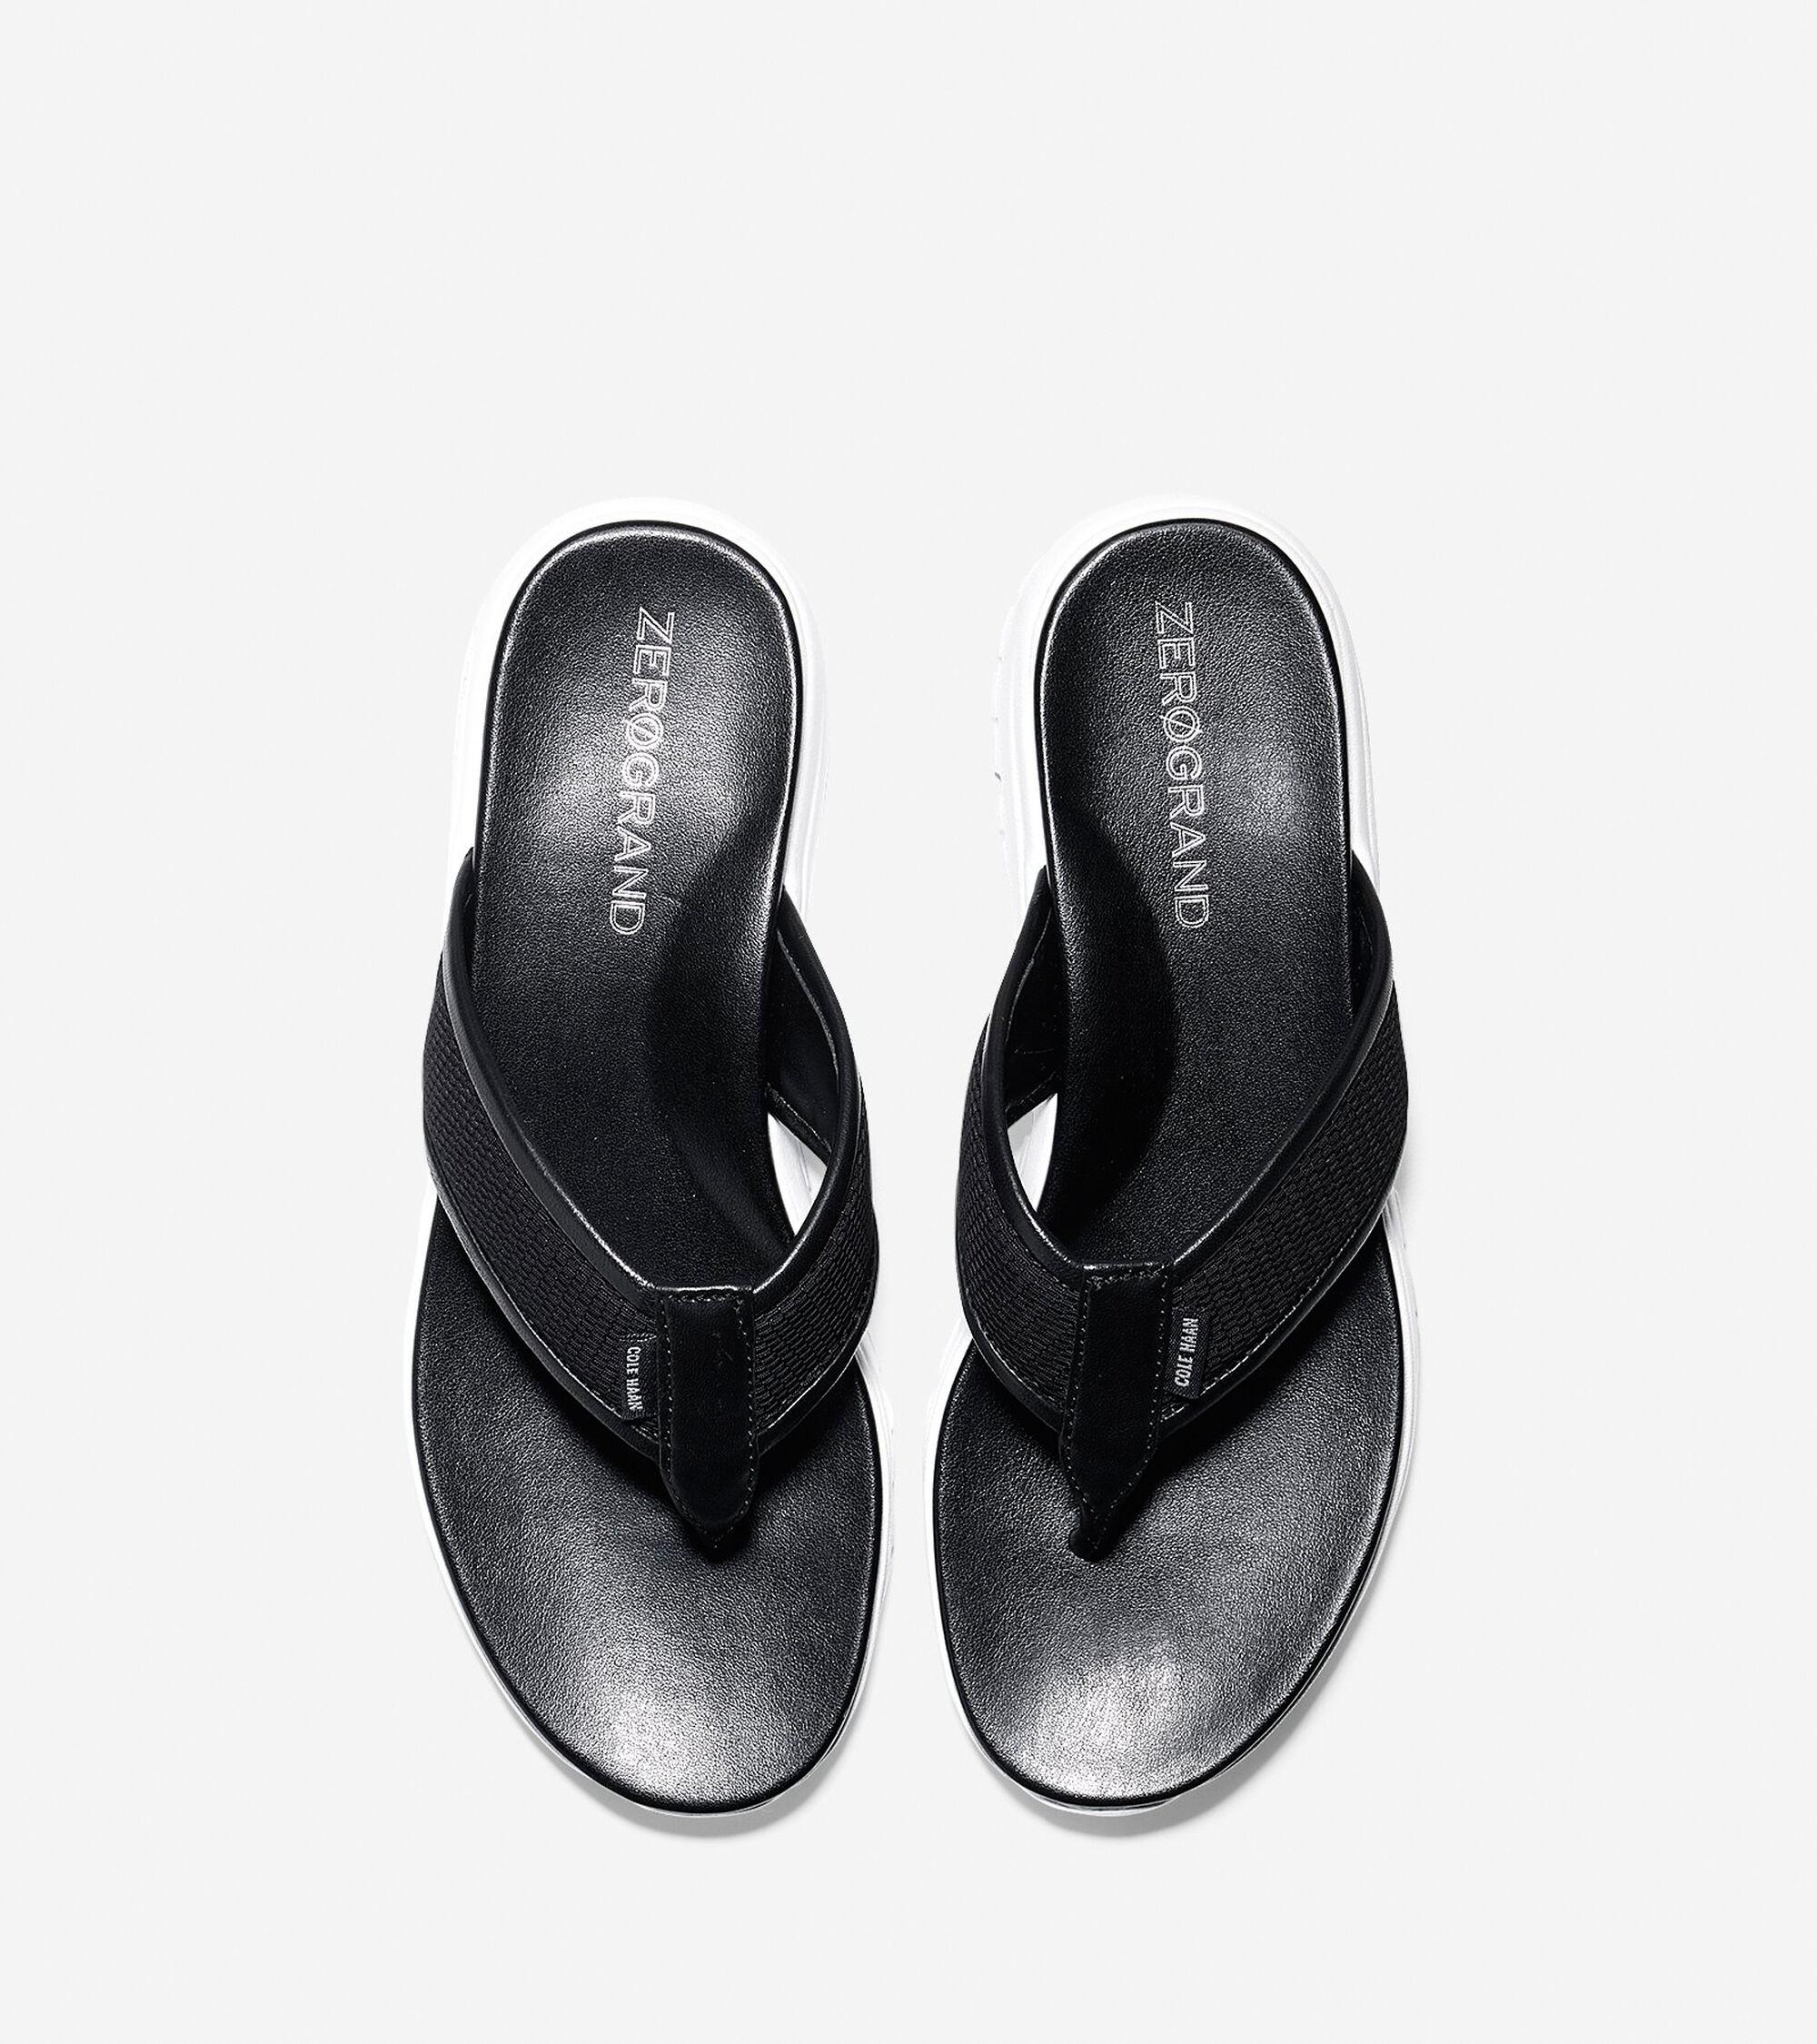 e781f74881b3 Womens ZEROGRAND Thong Sandals in Black